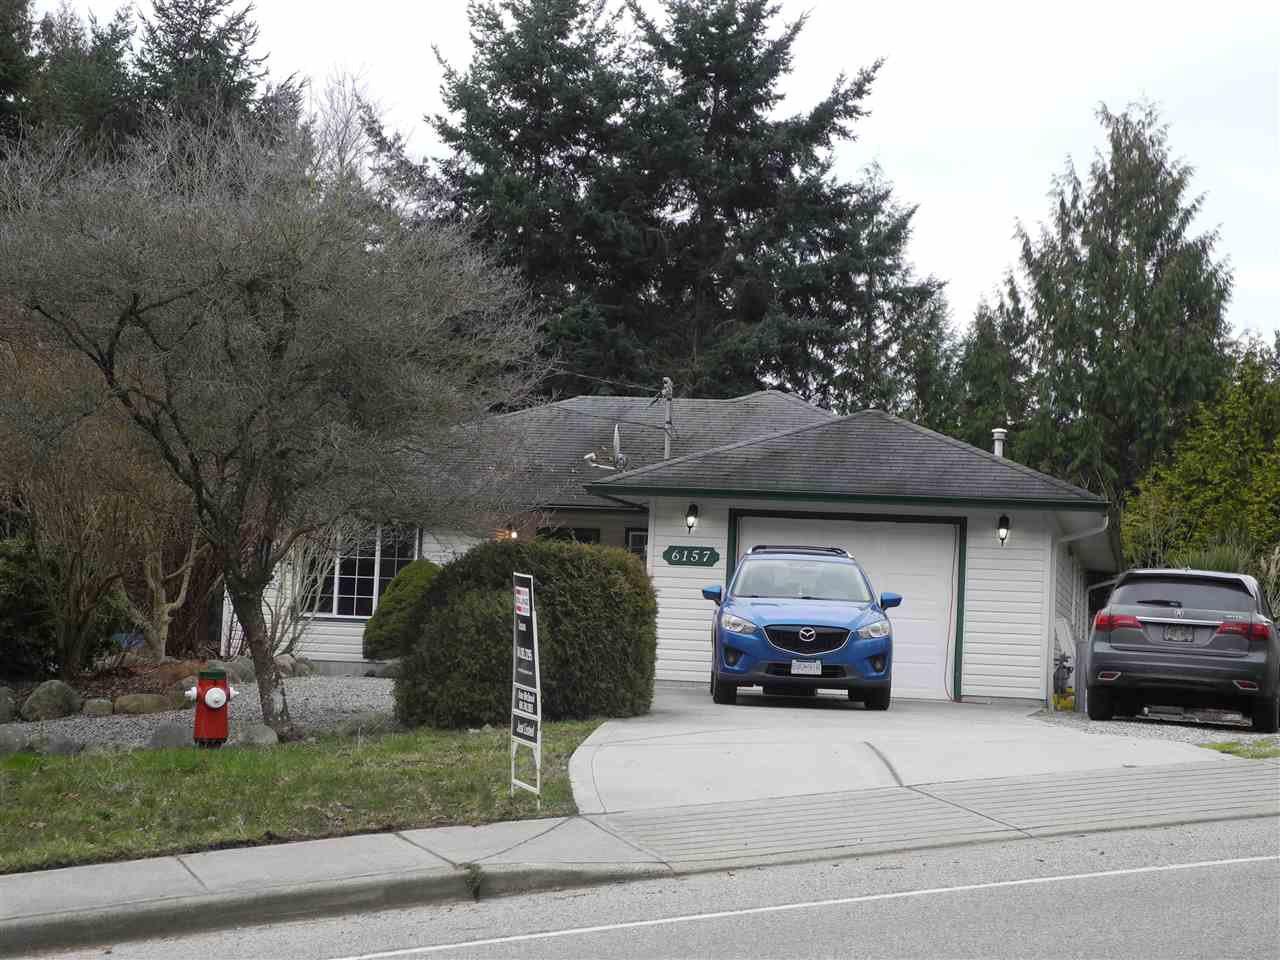 "Main Photo: 6157 NORWEST BAY Road in Sechelt: Sechelt District House for sale in ""West Sechelt"" (Sunshine Coast)  : MLS®# R2435156"